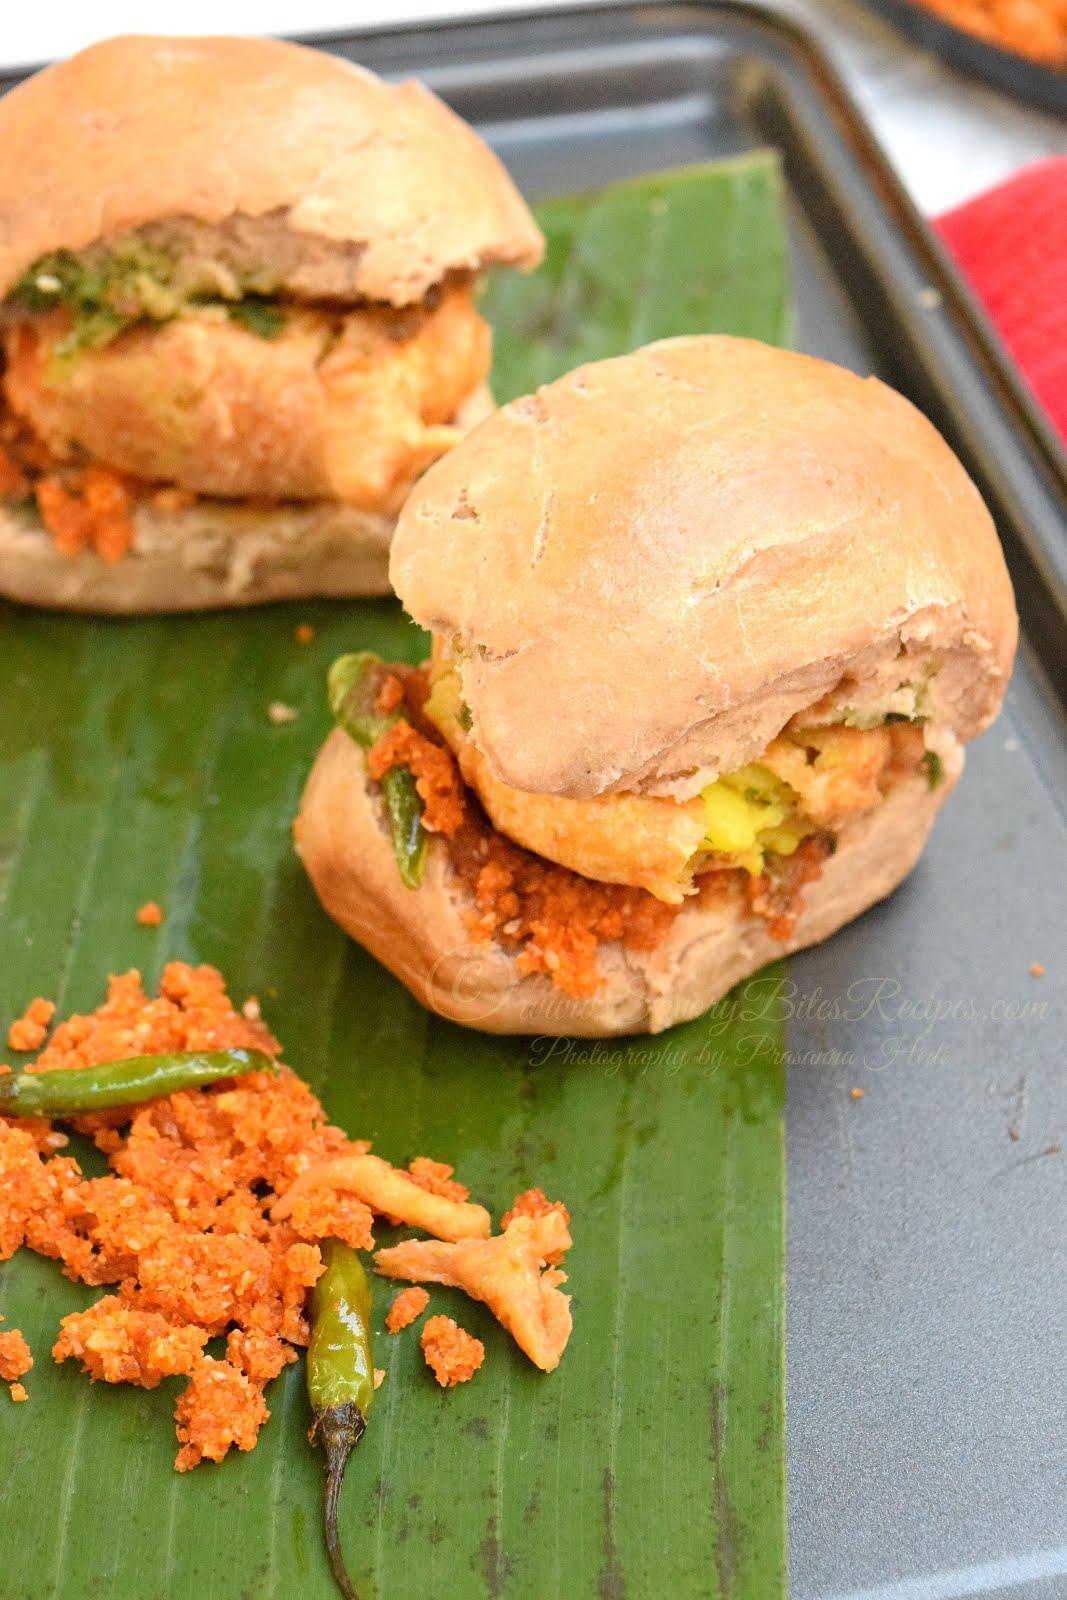 Bombay Mumbai Vada Pav Street Food Vegetarian Snack